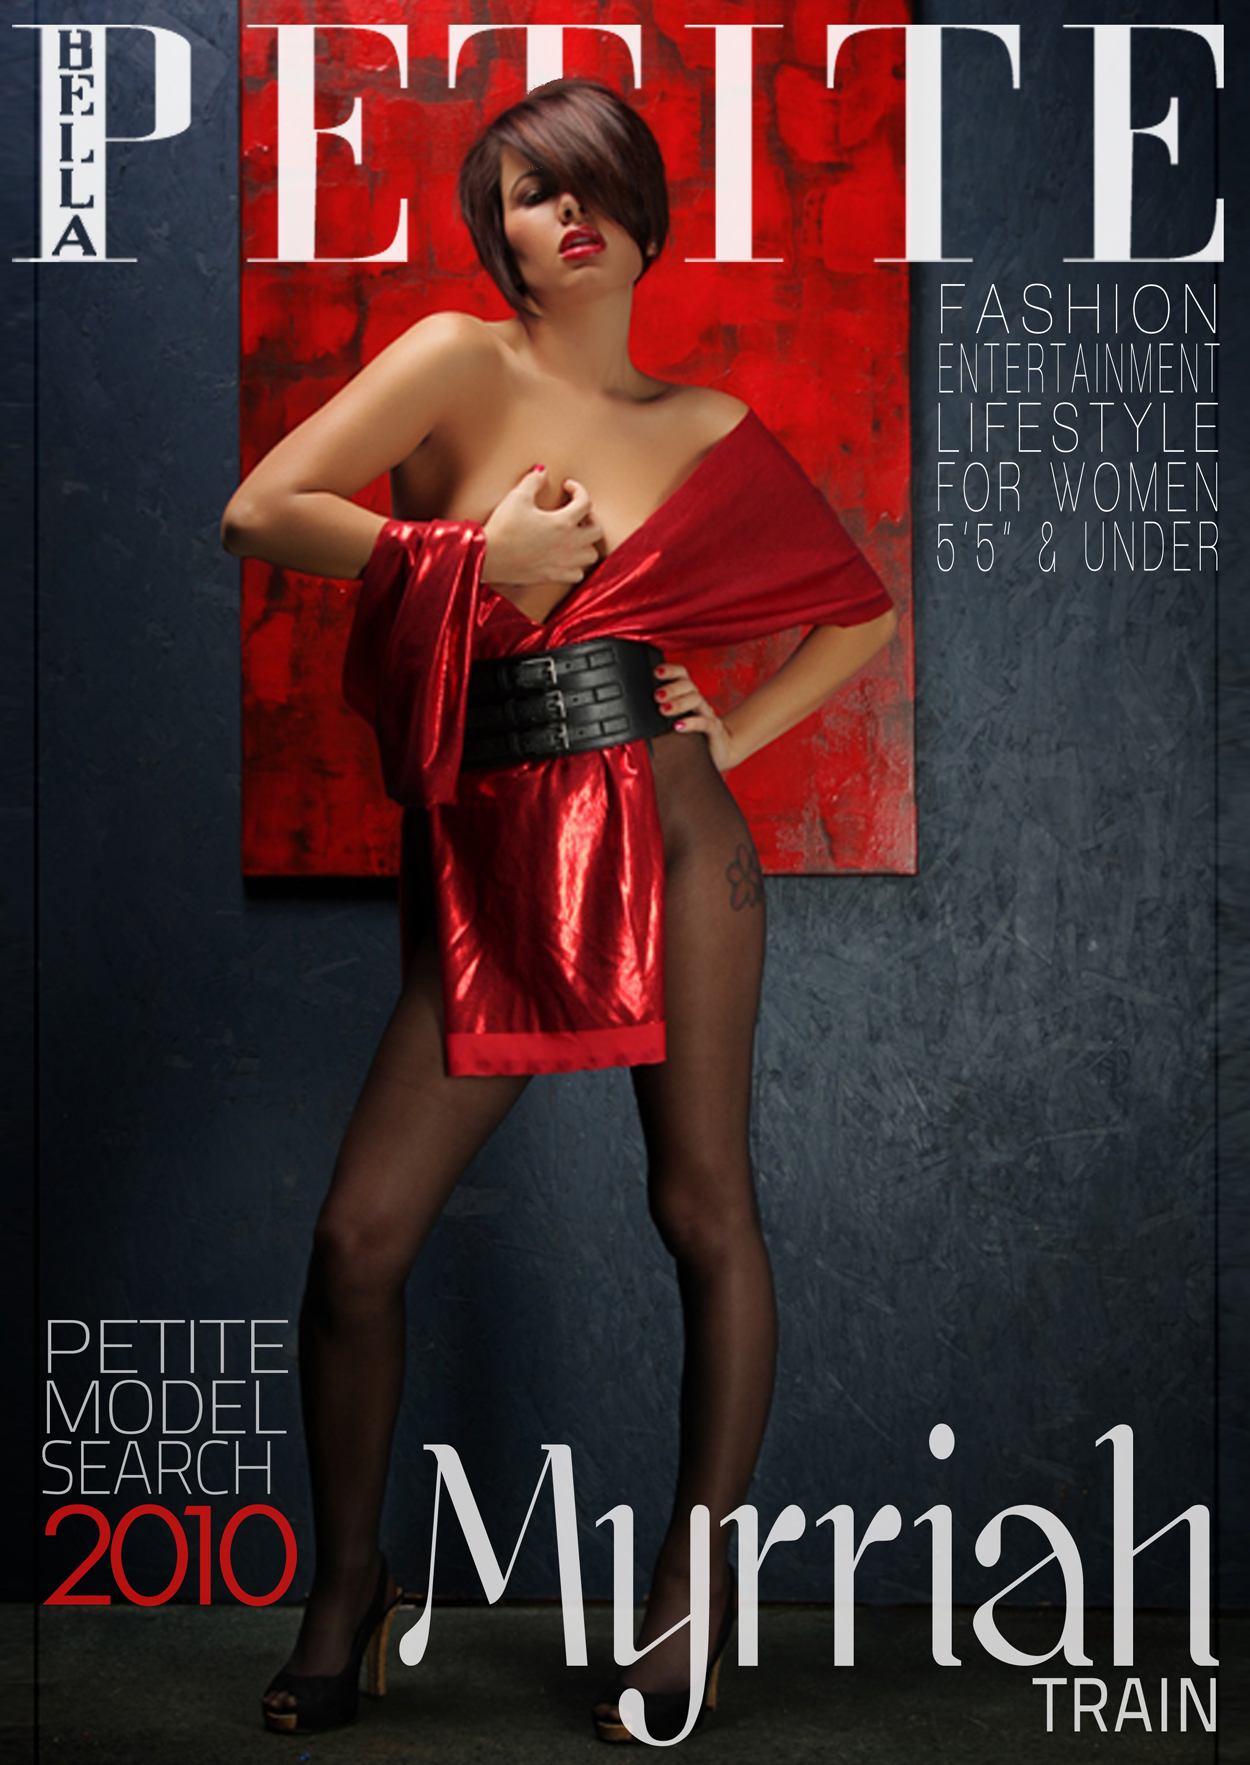 mma champ terrorized by petite tv reporter petite women bella petite. Black Bedroom Furniture Sets. Home Design Ideas